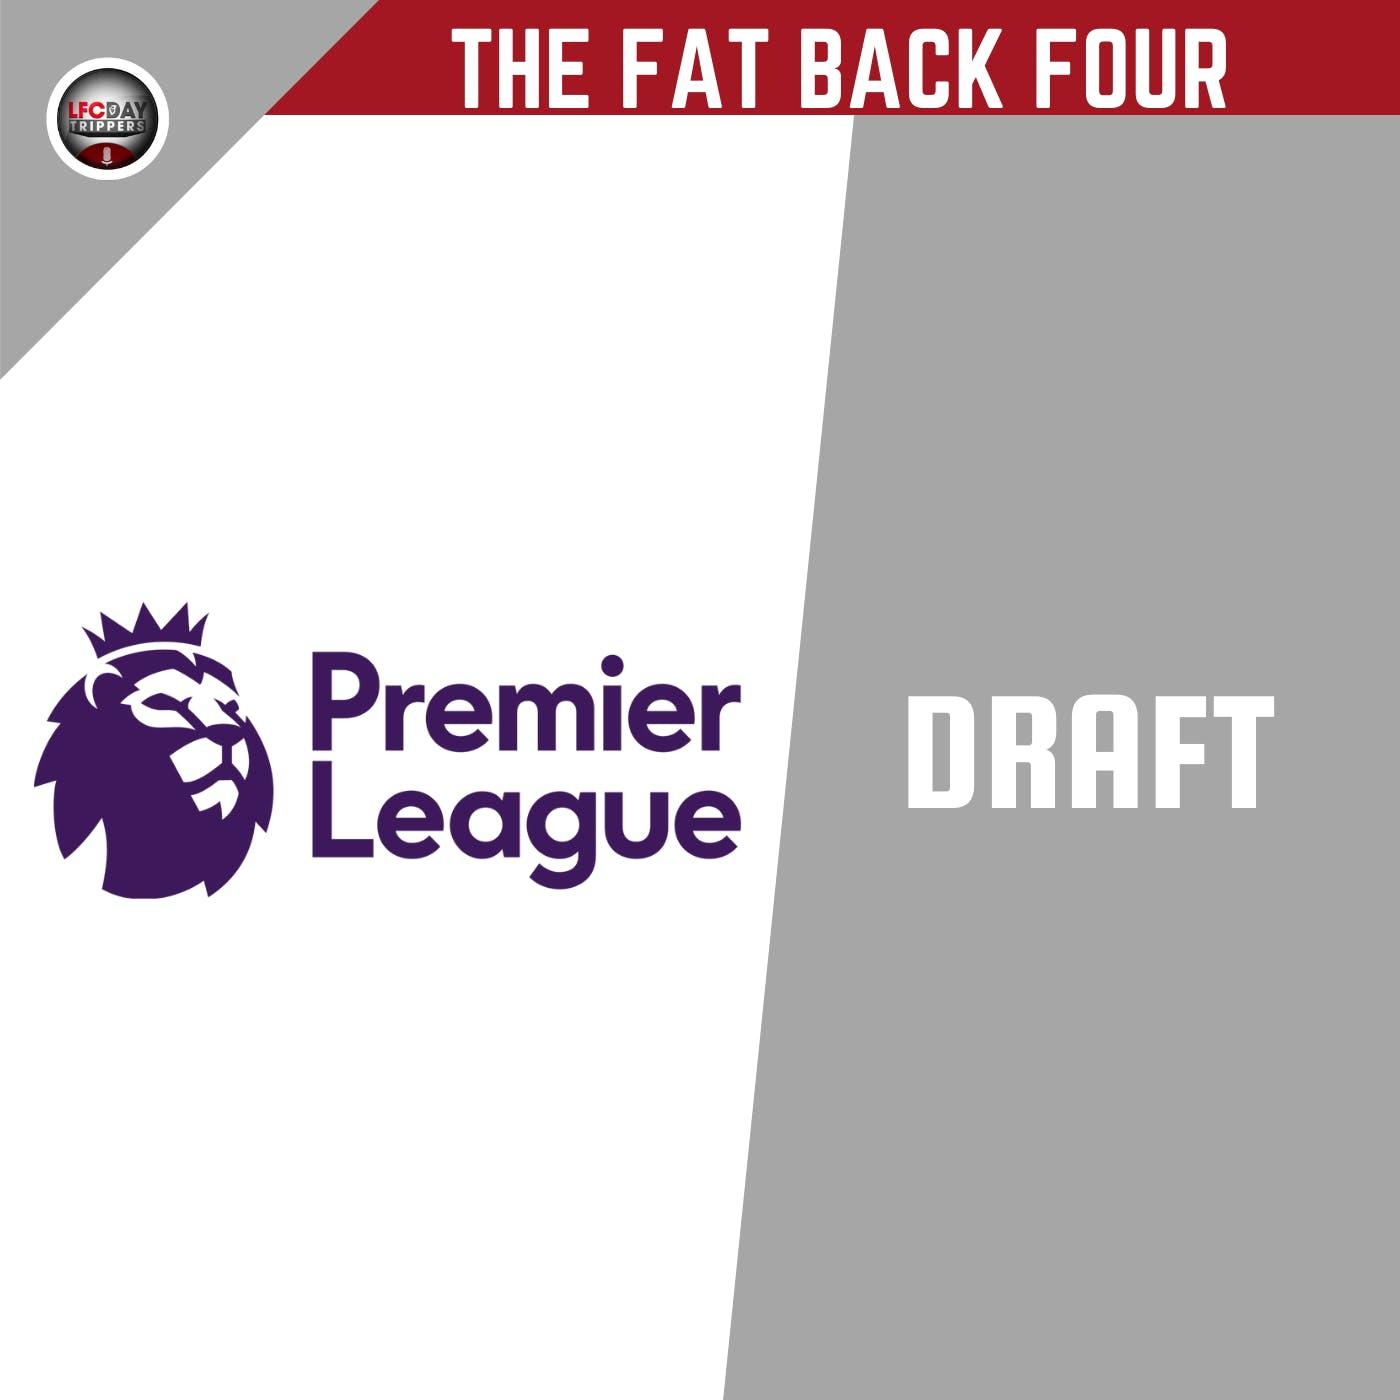 Premier League Draft | LFC Daytrippers